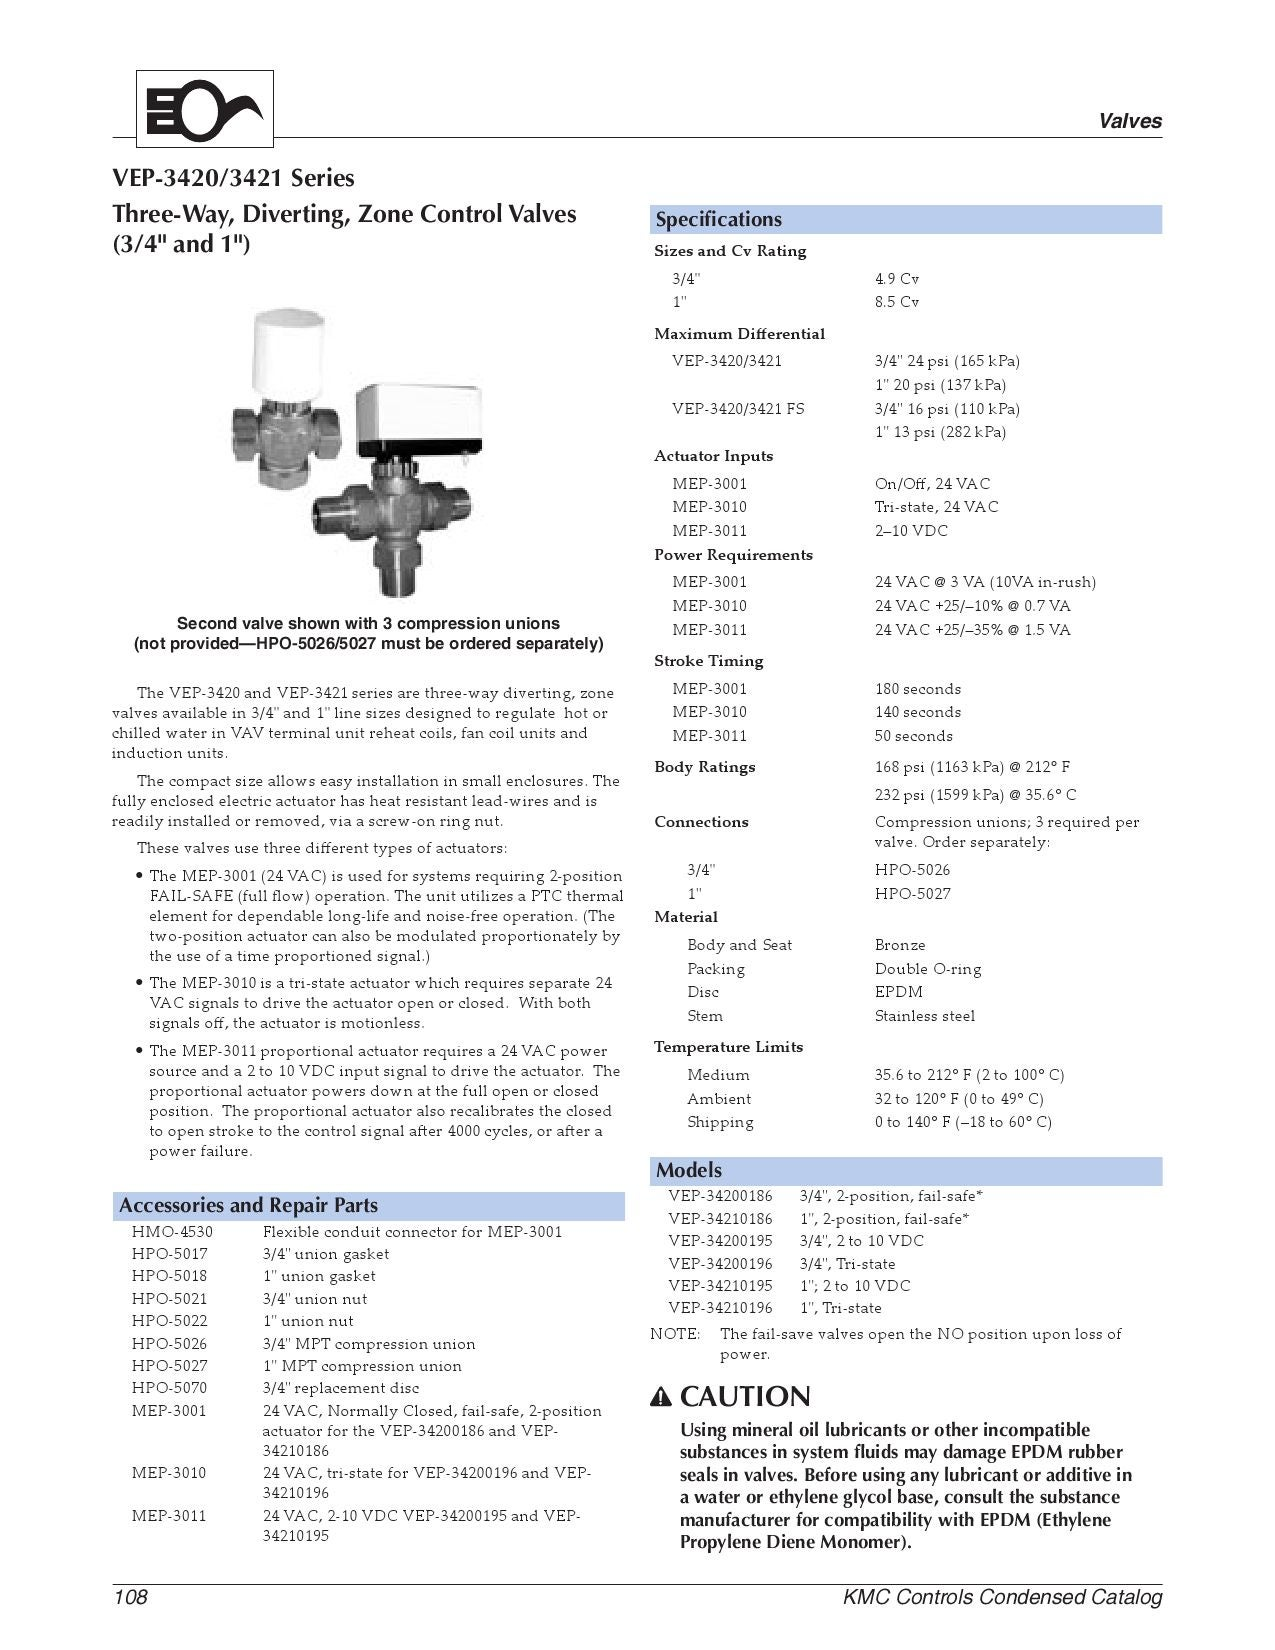 Catalogue Pneumatique Kmc Controls By Ga 233 Tan Cuerrier Issuu